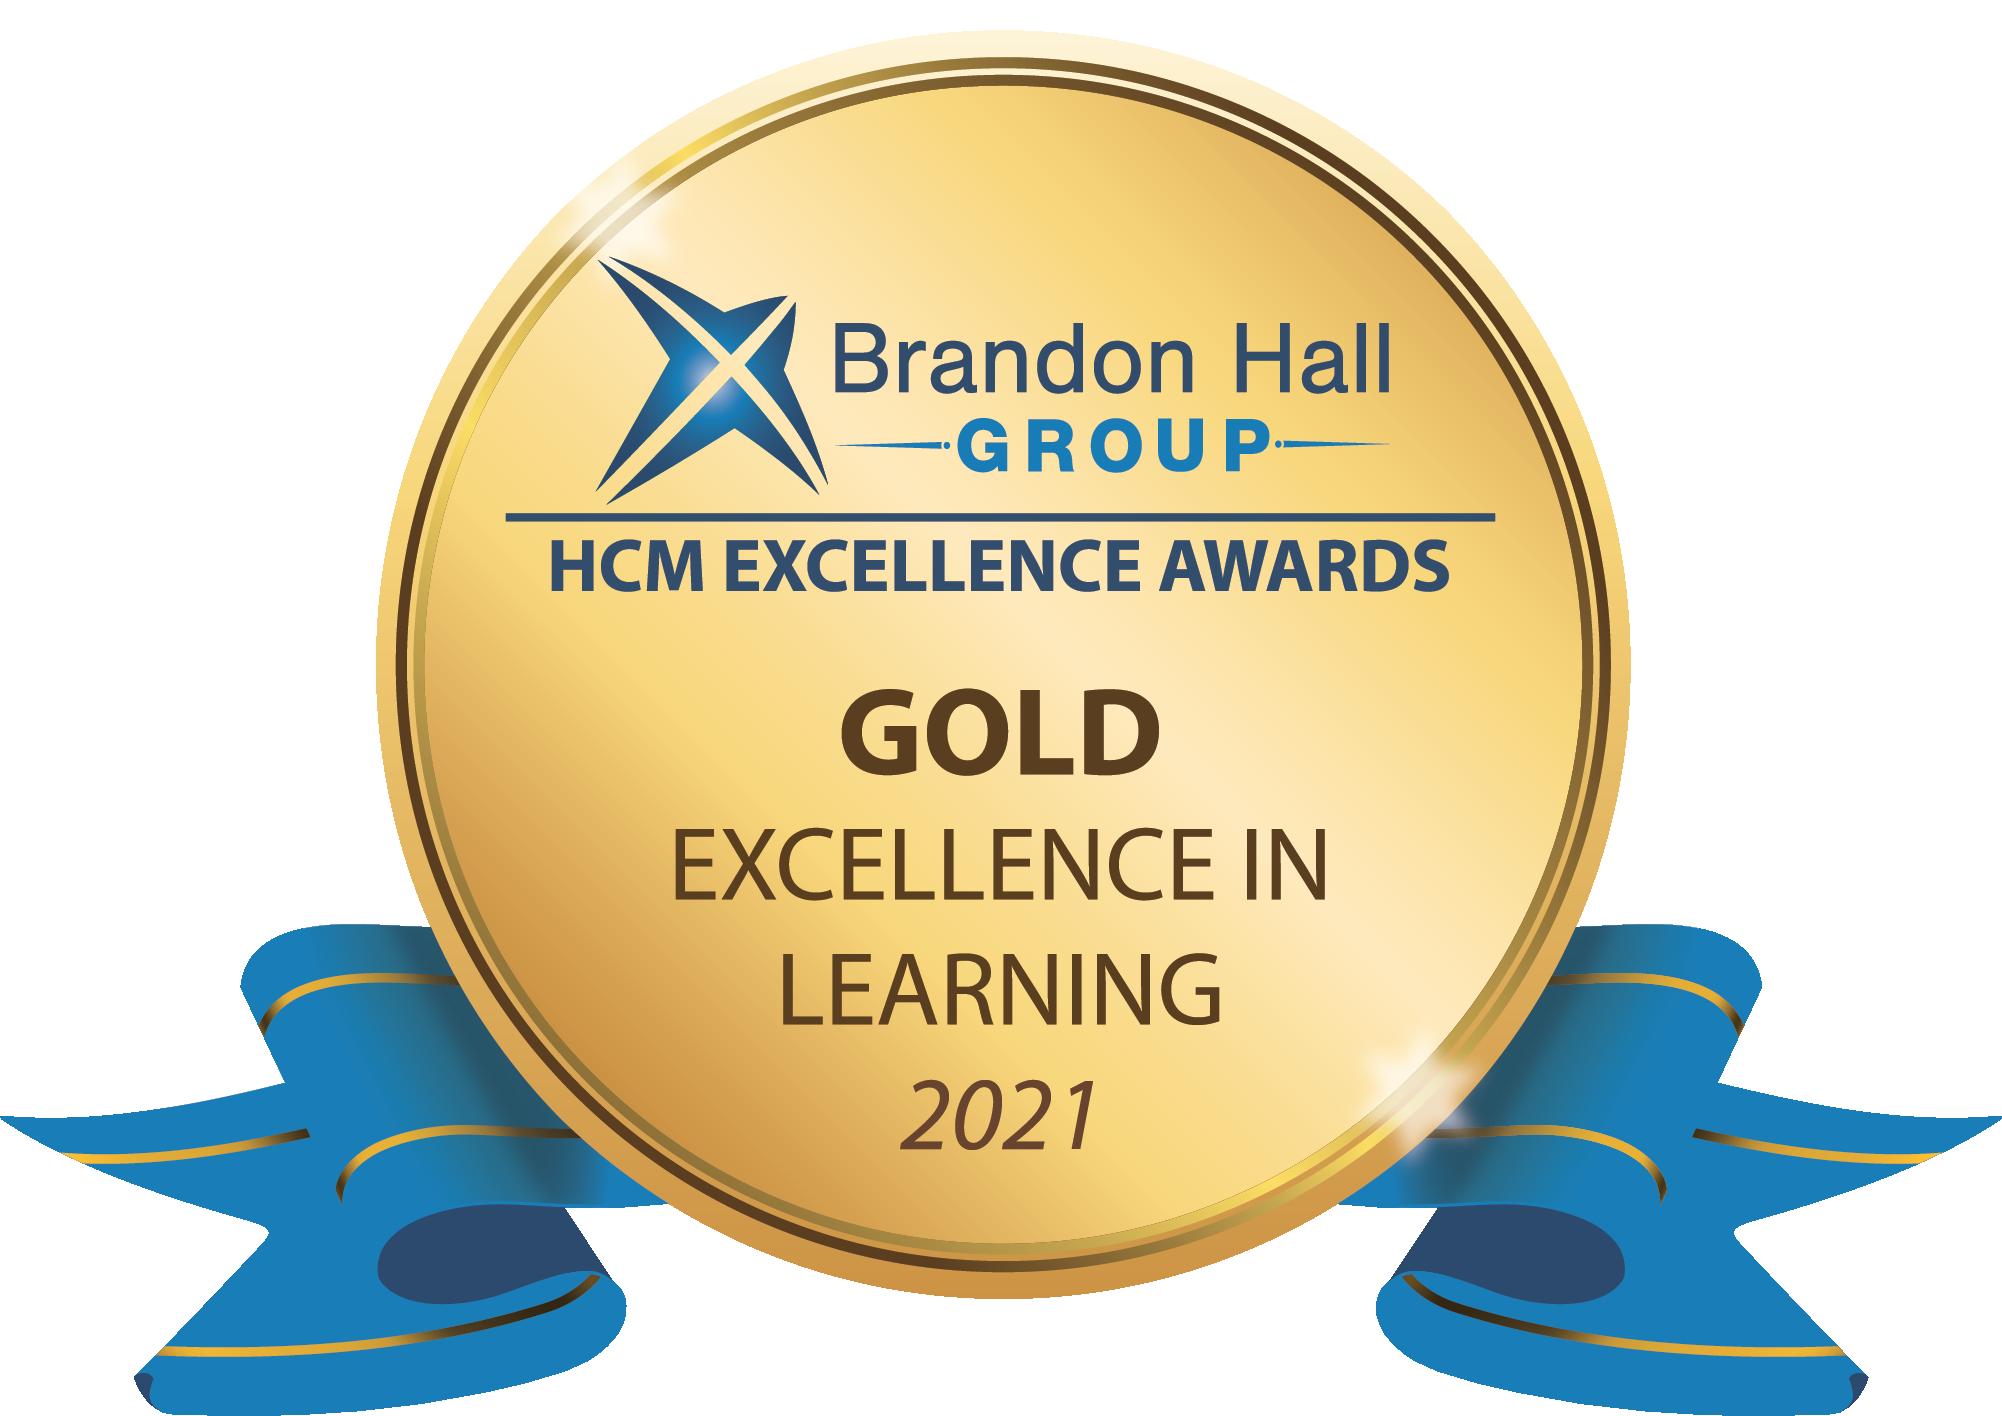 Brandon Hall Group Award Win - Bulletproof for eLearning